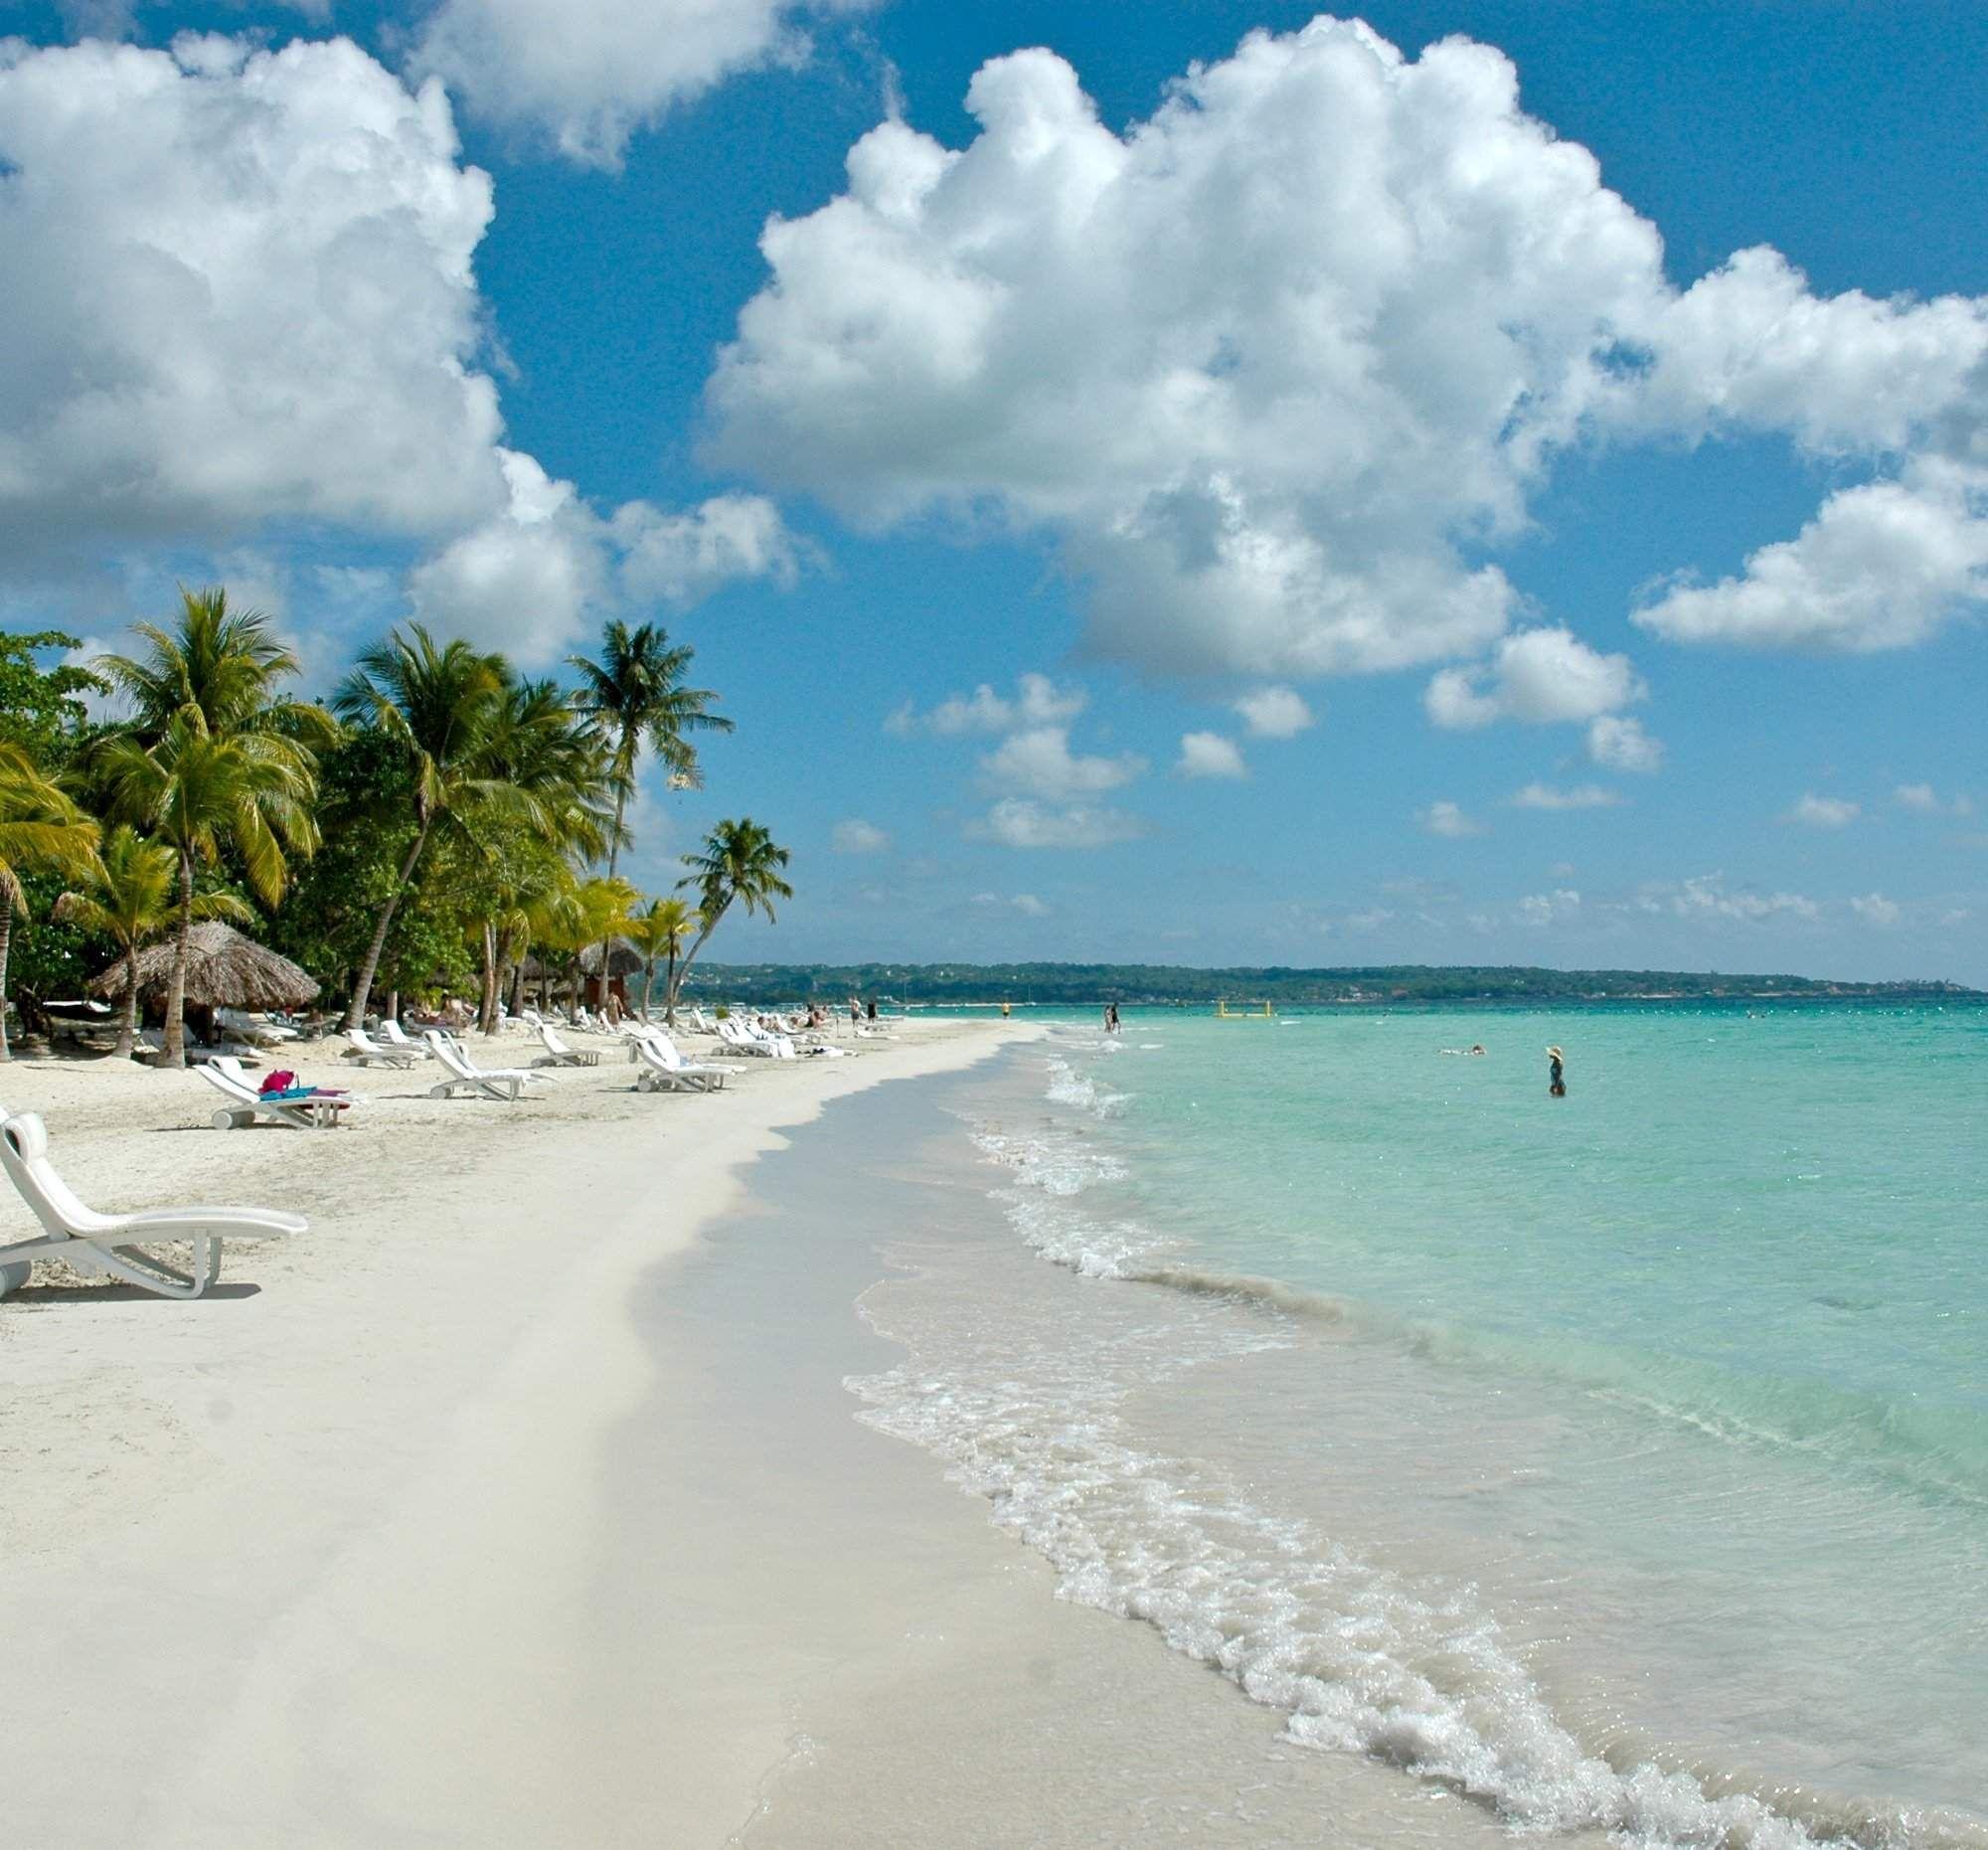 91 Best At The Beach Images On Pinterest: Best 25+ Jamaica Beach Ideas On Pinterest